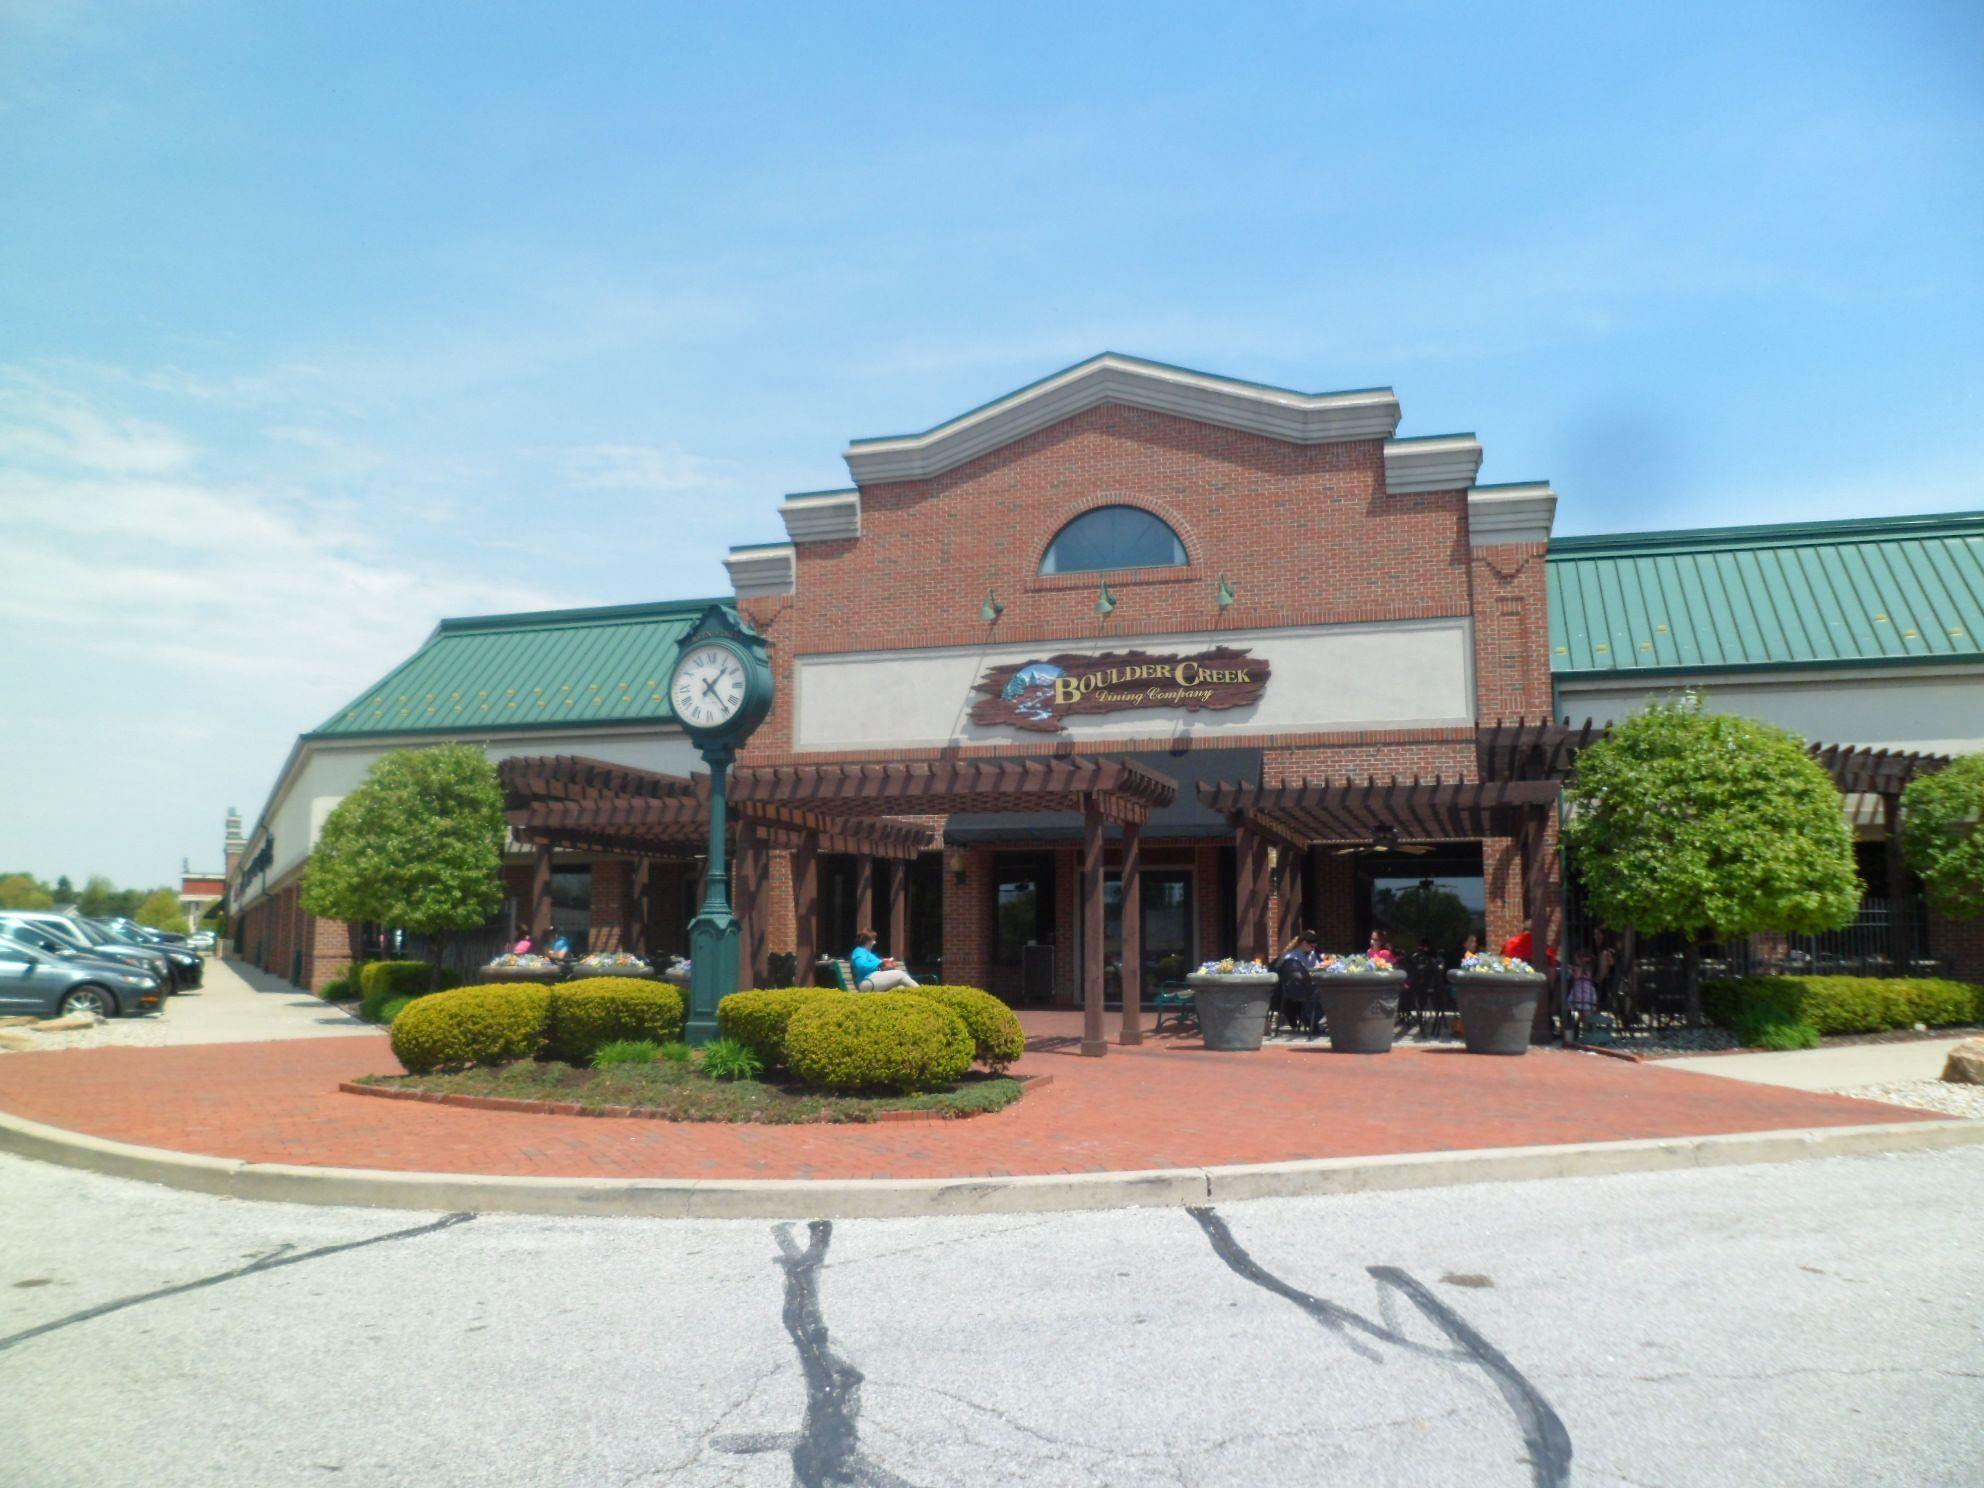 Boulder Creek Dining Company Brownsburg Indiana